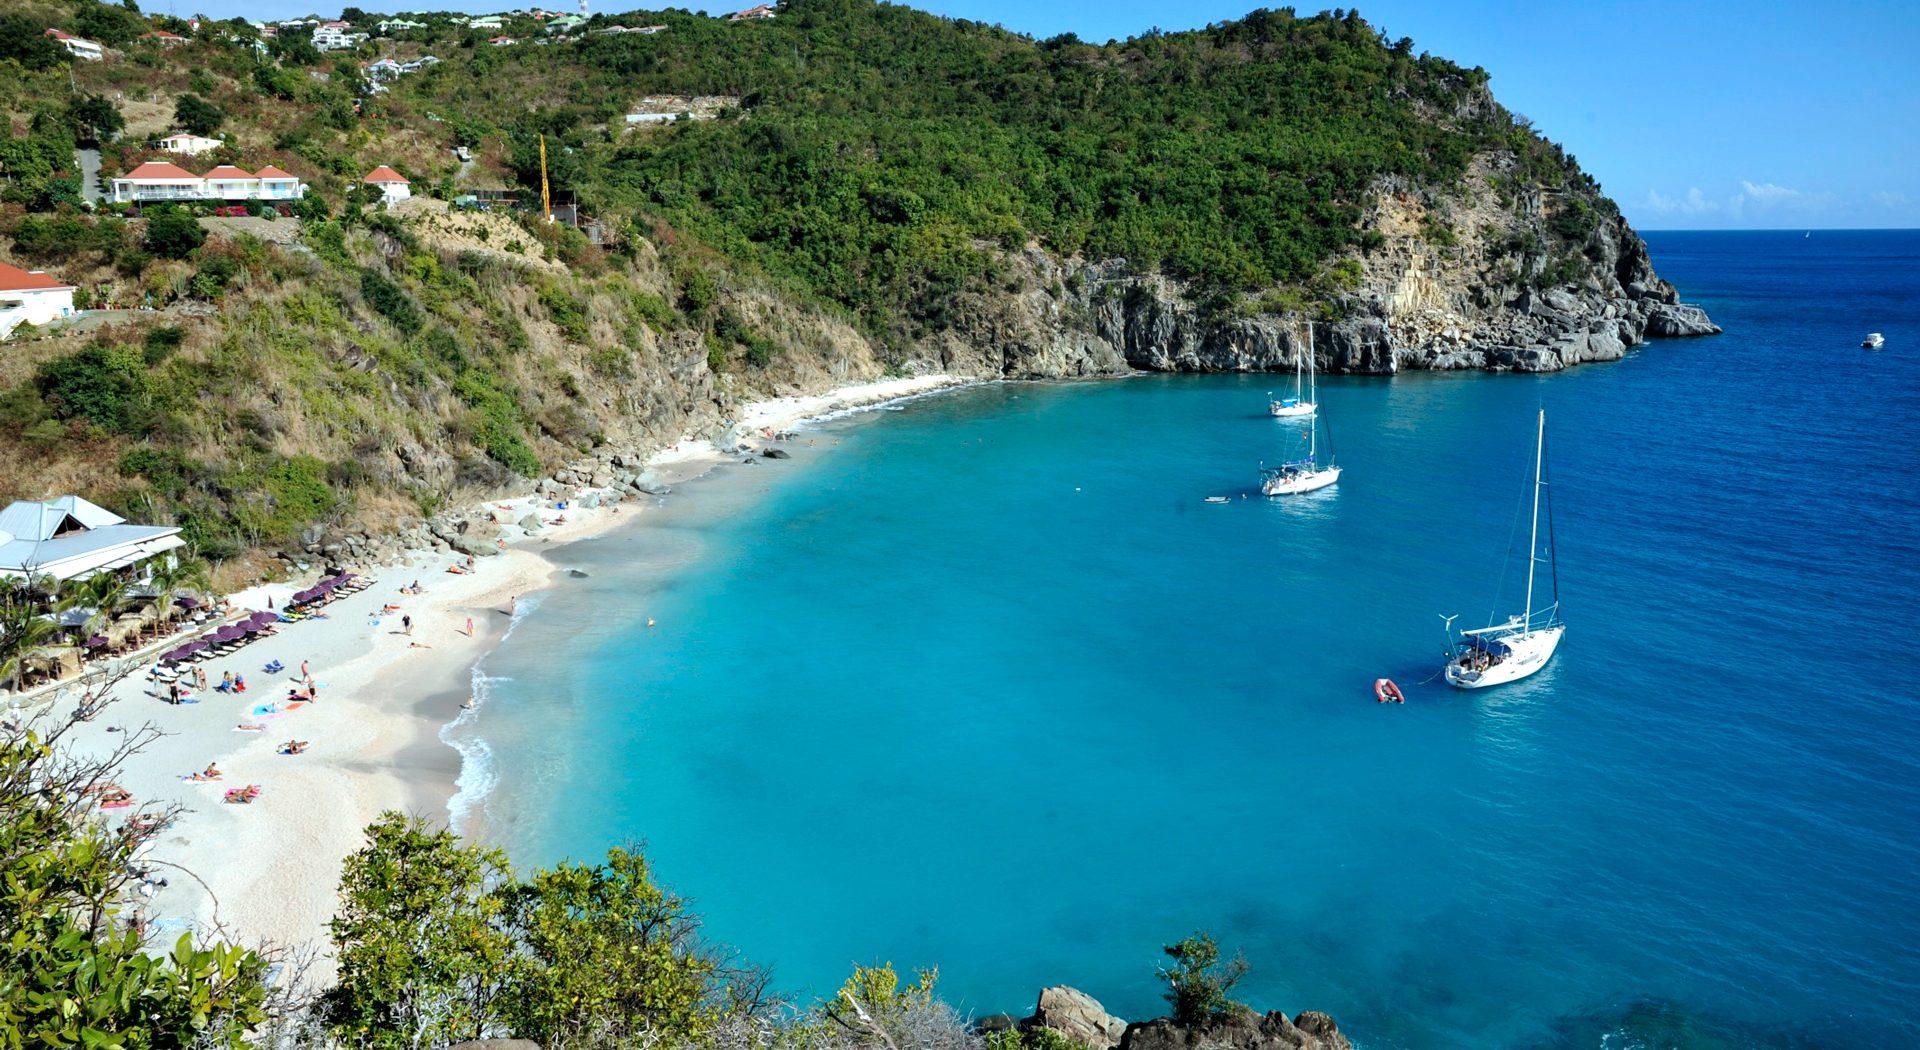 MEDITERRANEAN MOSAIC 2017 - Bare Necessities   Cruise Nude